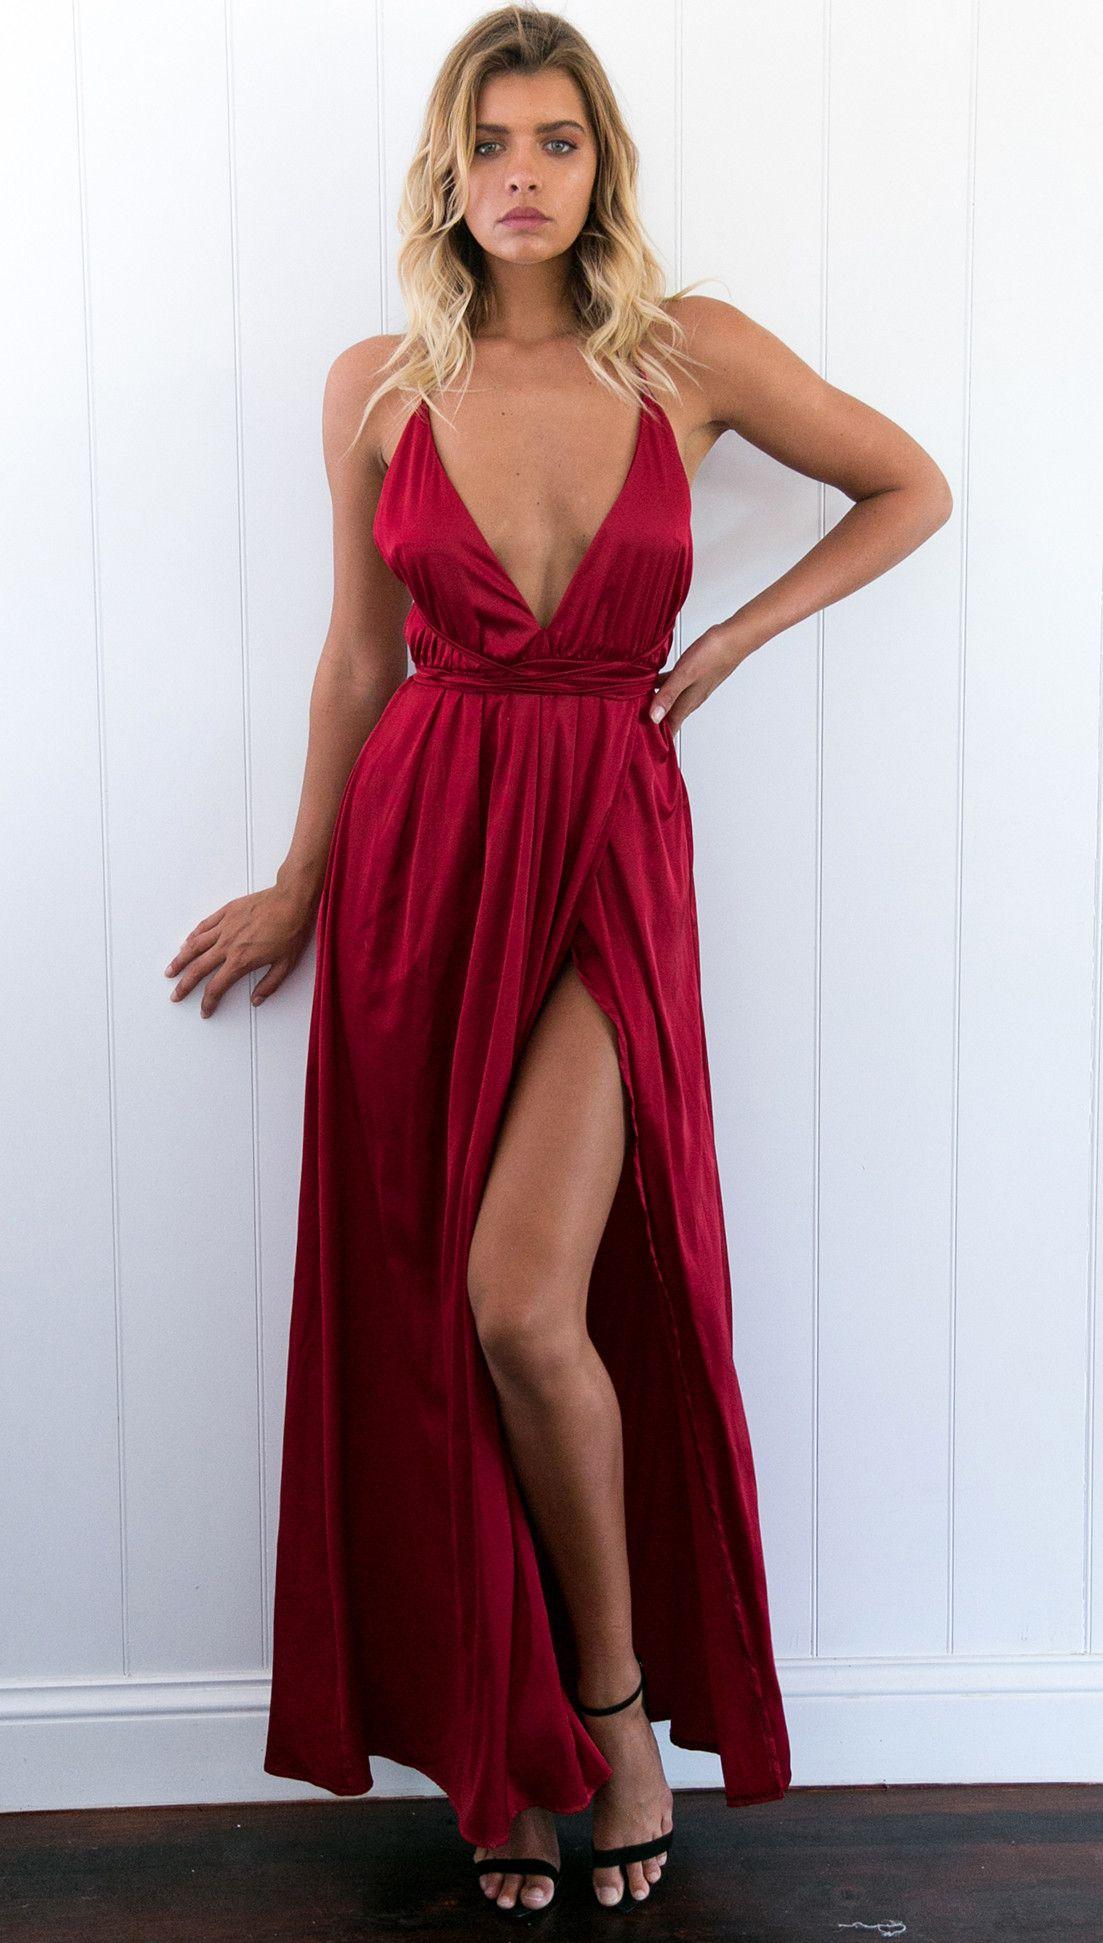 Sexy vneck long dark red prom dress evening dress with criss cross